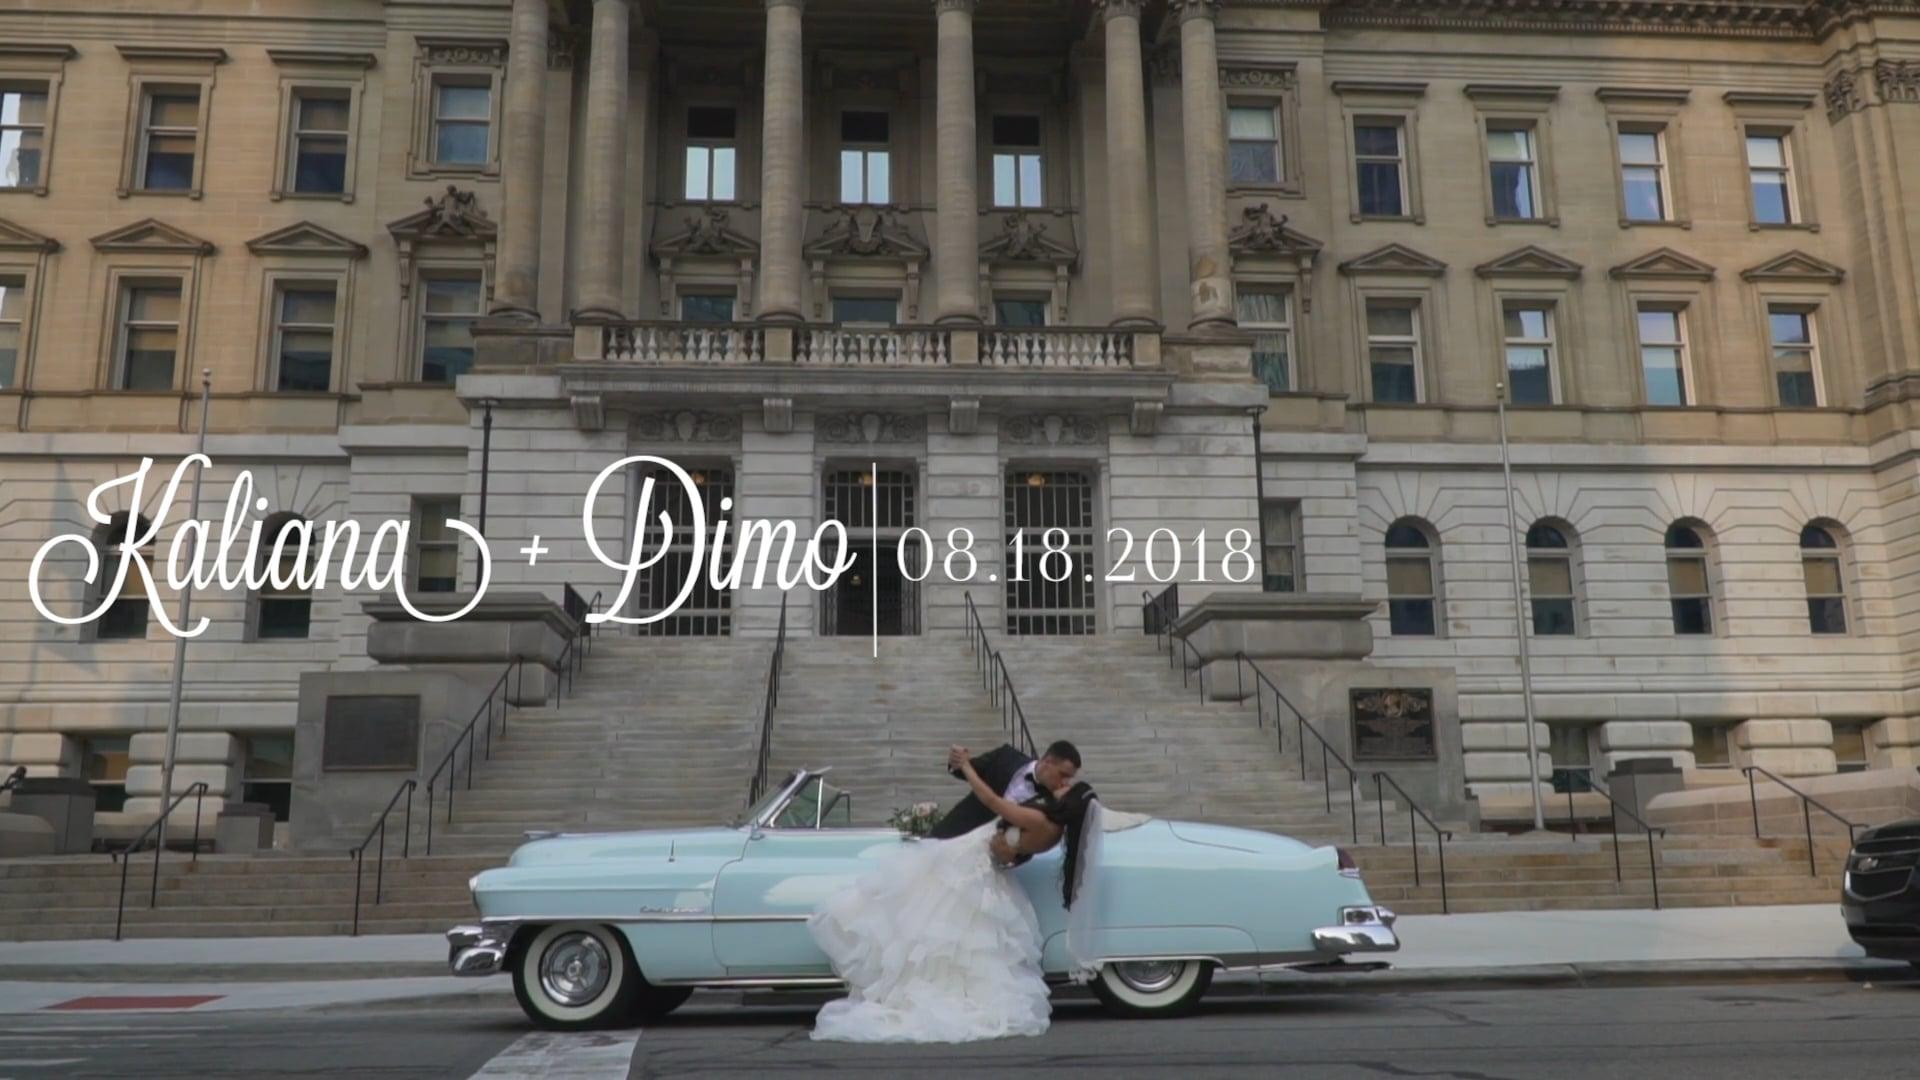 KALIANA + DIMO .The Trailer